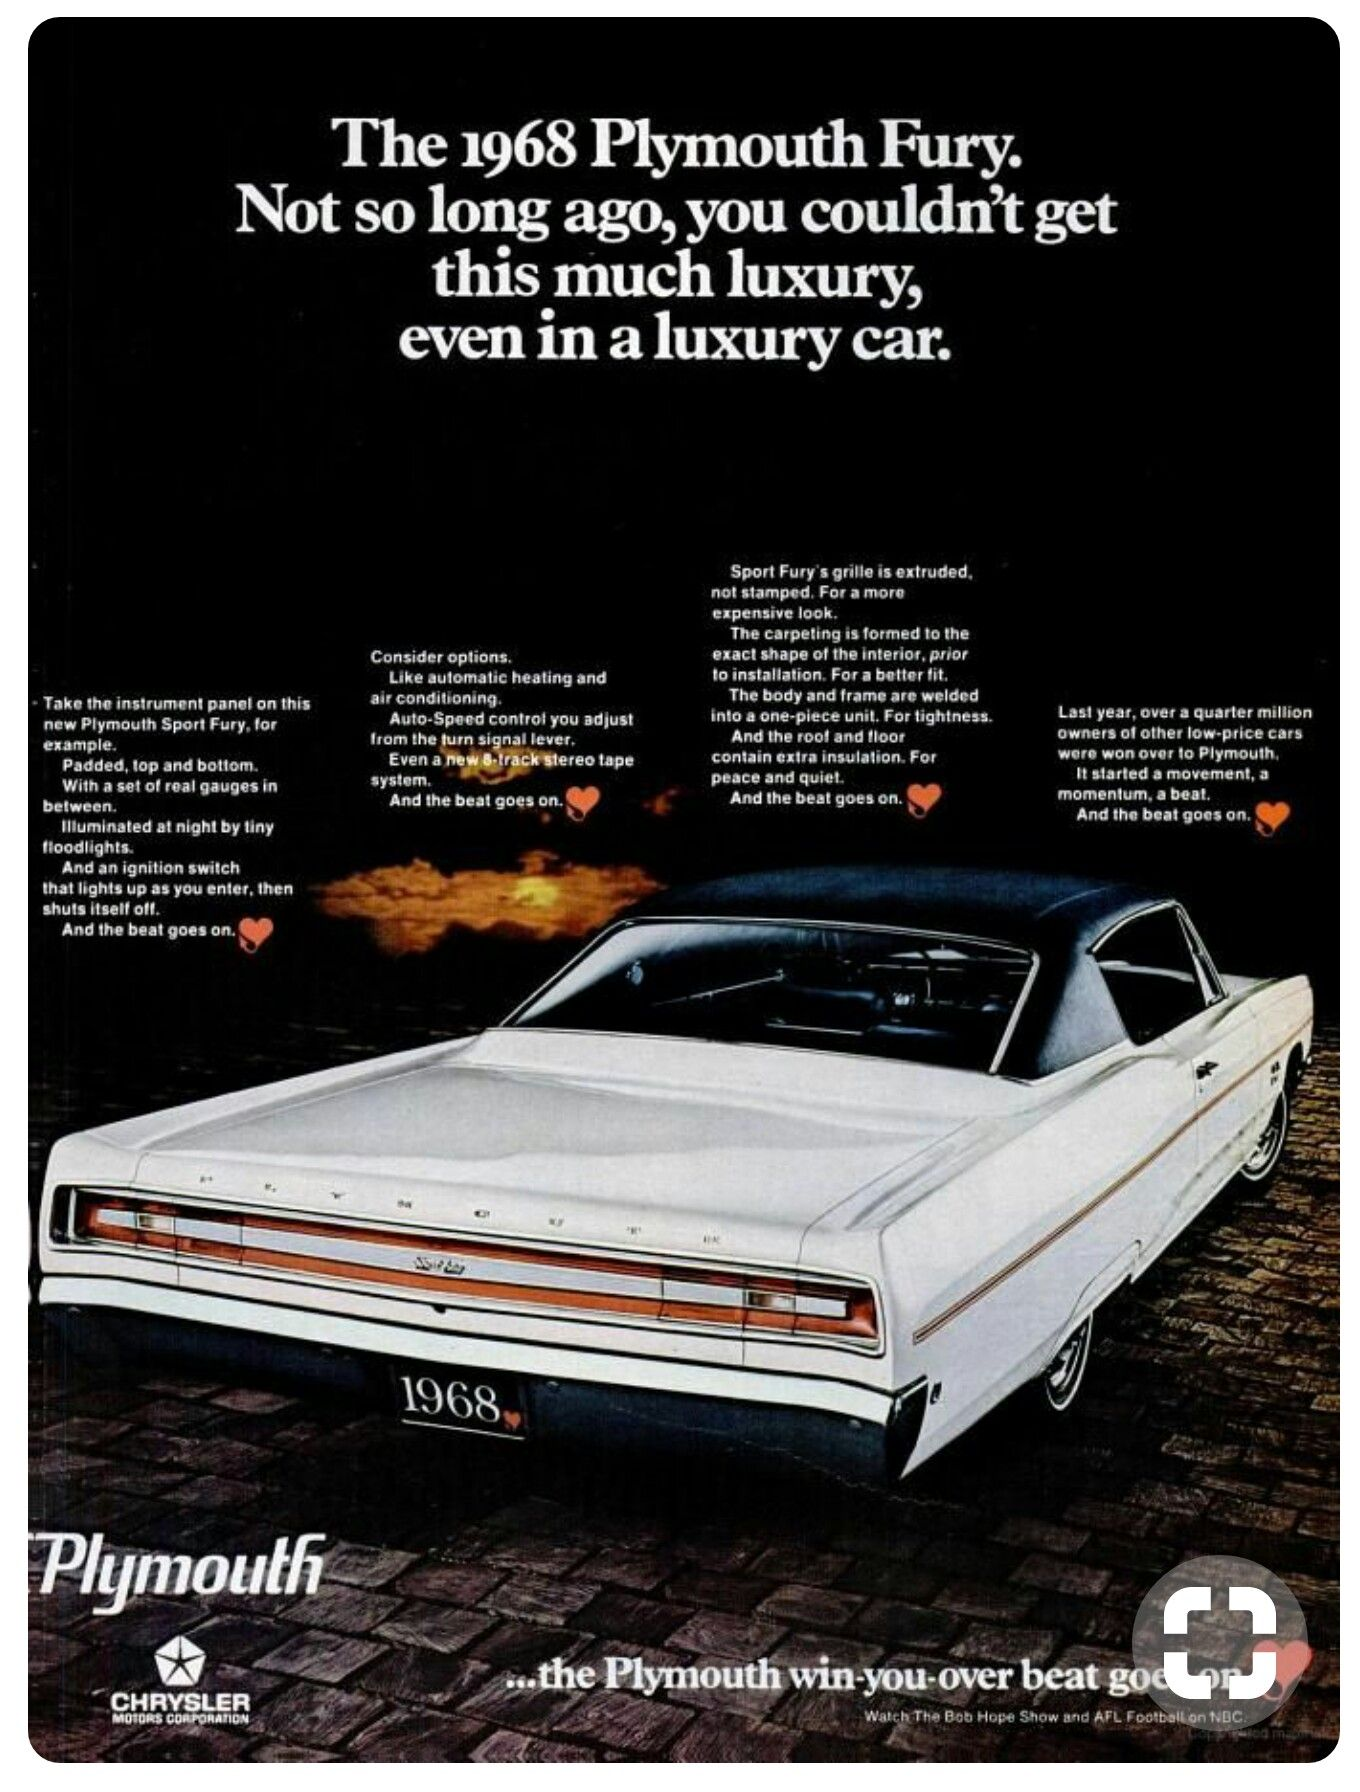 1968 Plymouth Fury Autos Automoviles Autos Antiguos